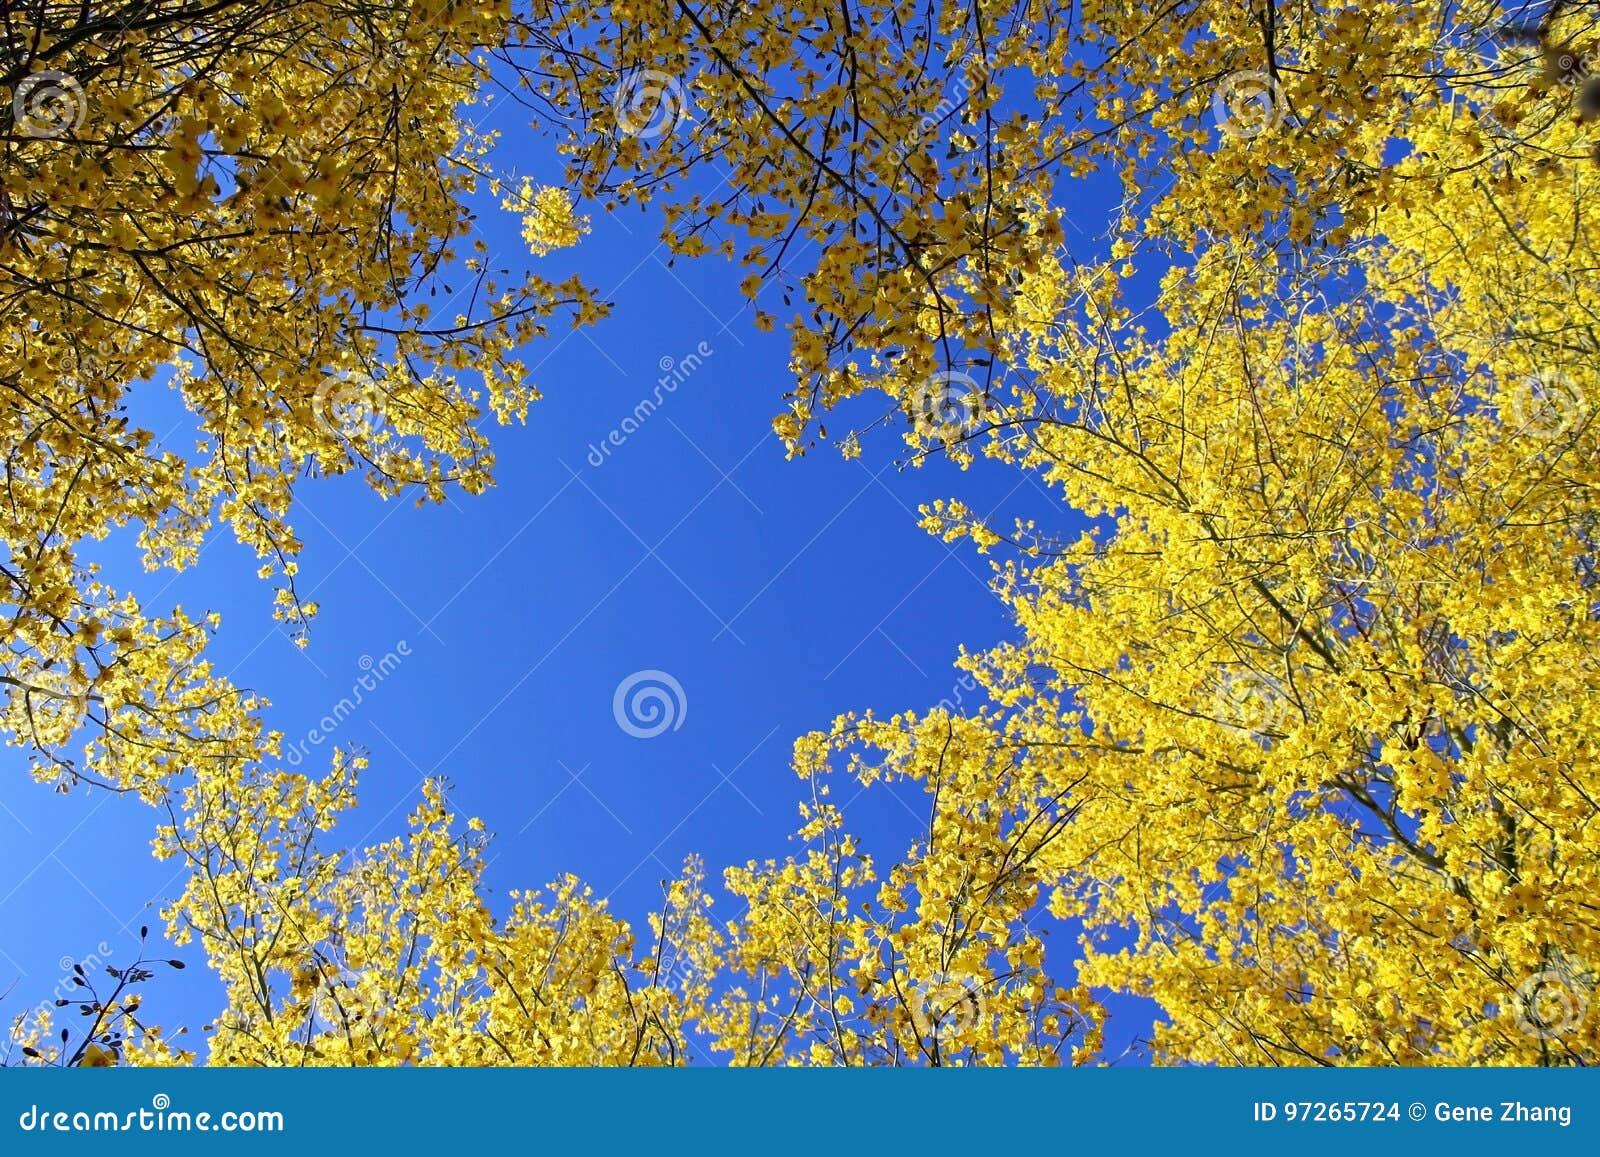 Palo Verde Arizona State Tree Stock Photo Image Of Flowers Blue